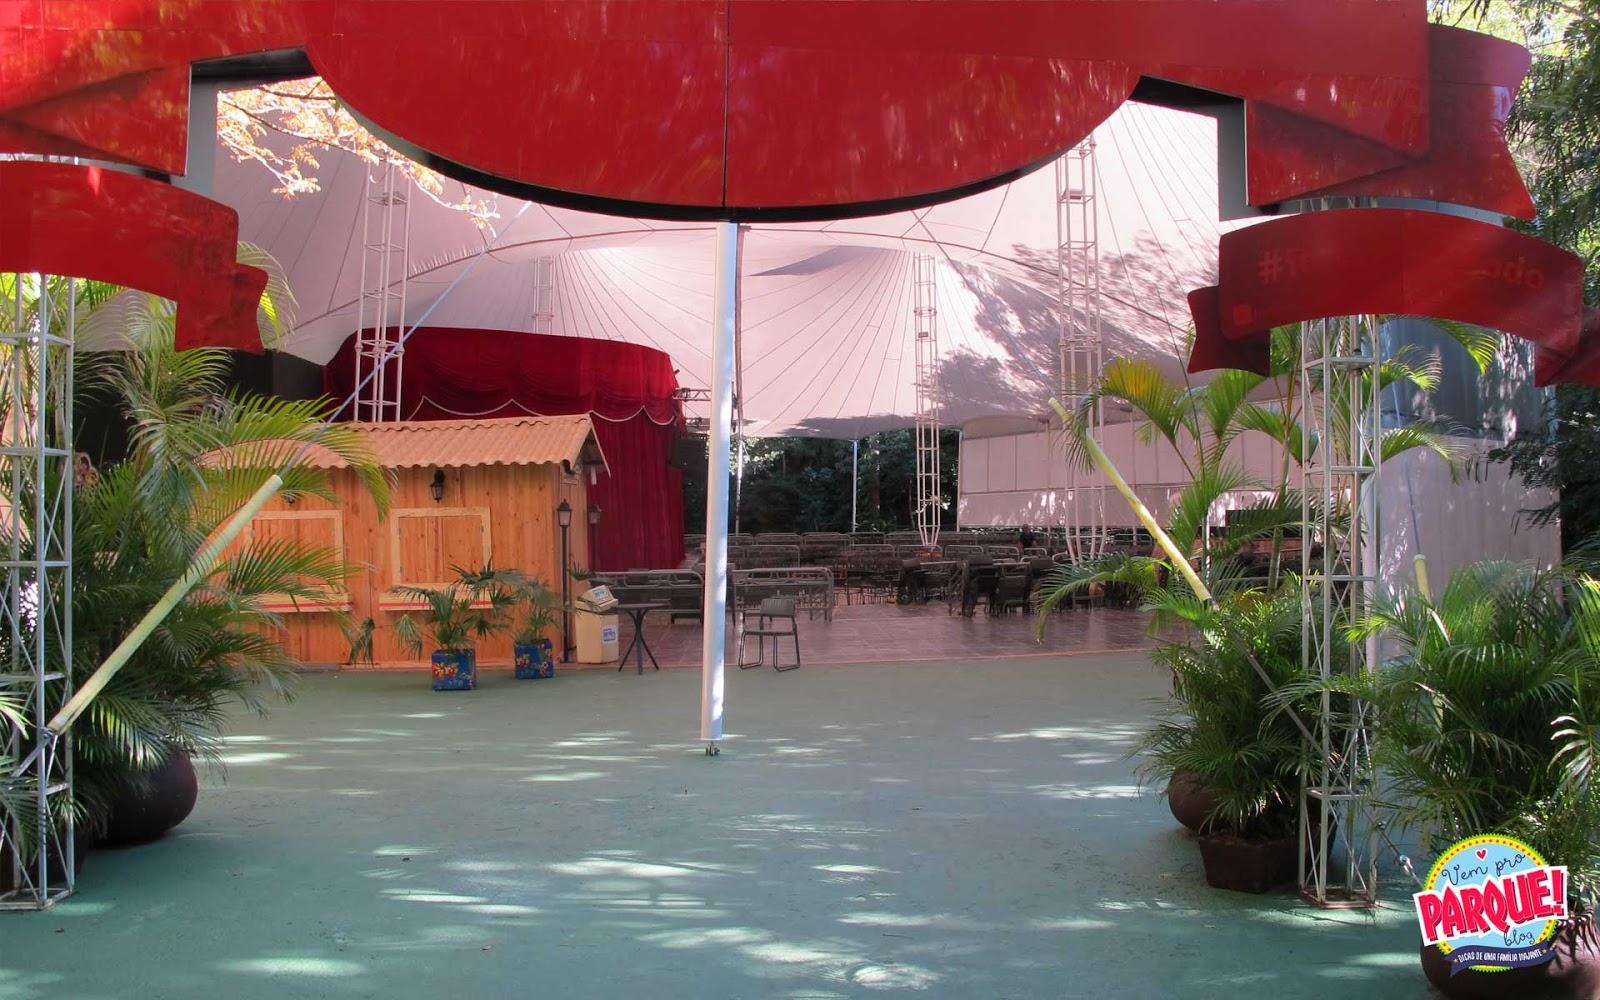 Parque das Fontes Rio Quente Resorts